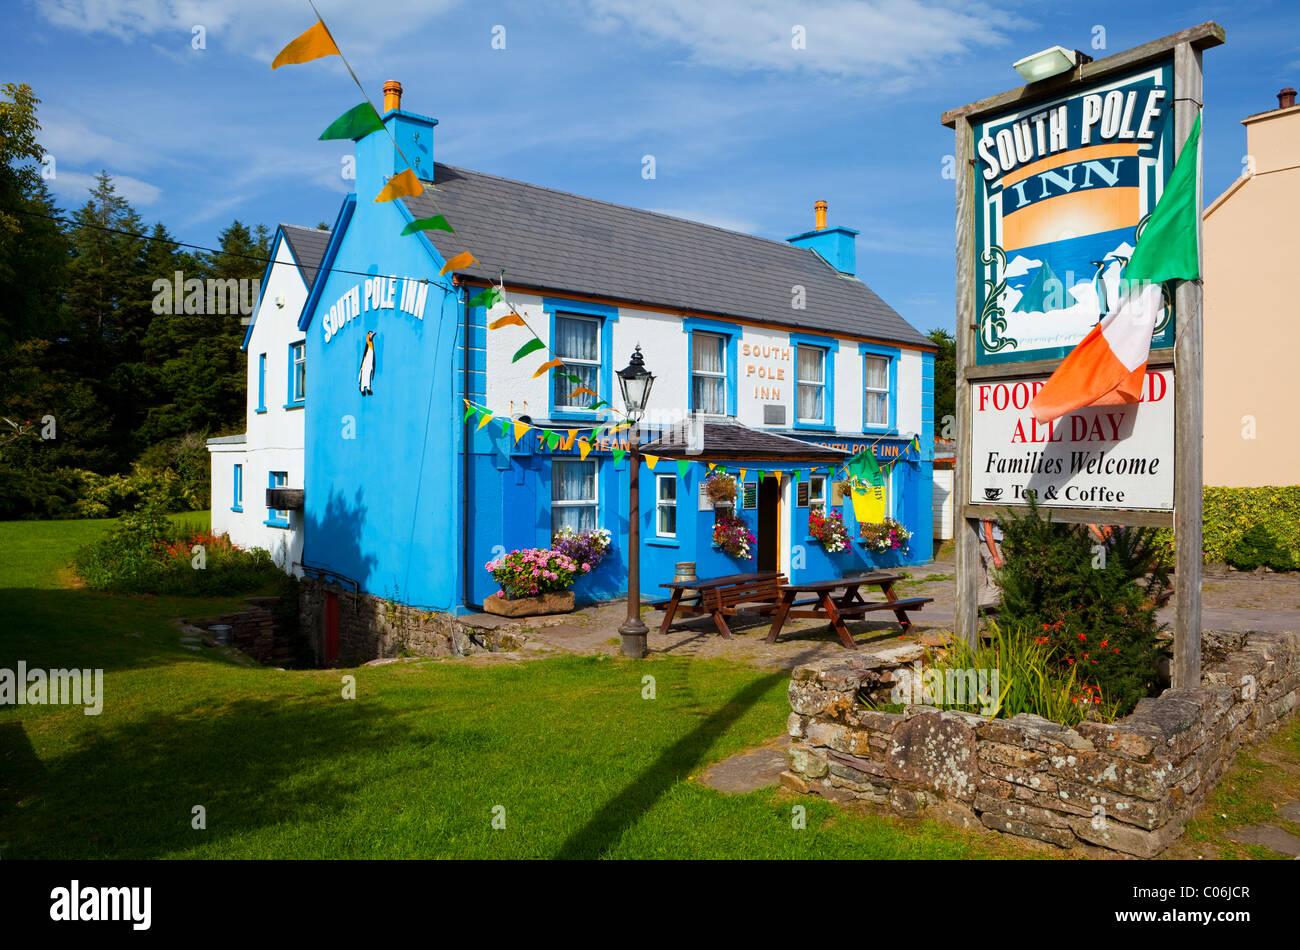 Early 20th Century Antarctic Explorer Tom Crean's Pub, The South Pole Inn, Anascaul, Dingle Peninsula, County - Stock Image